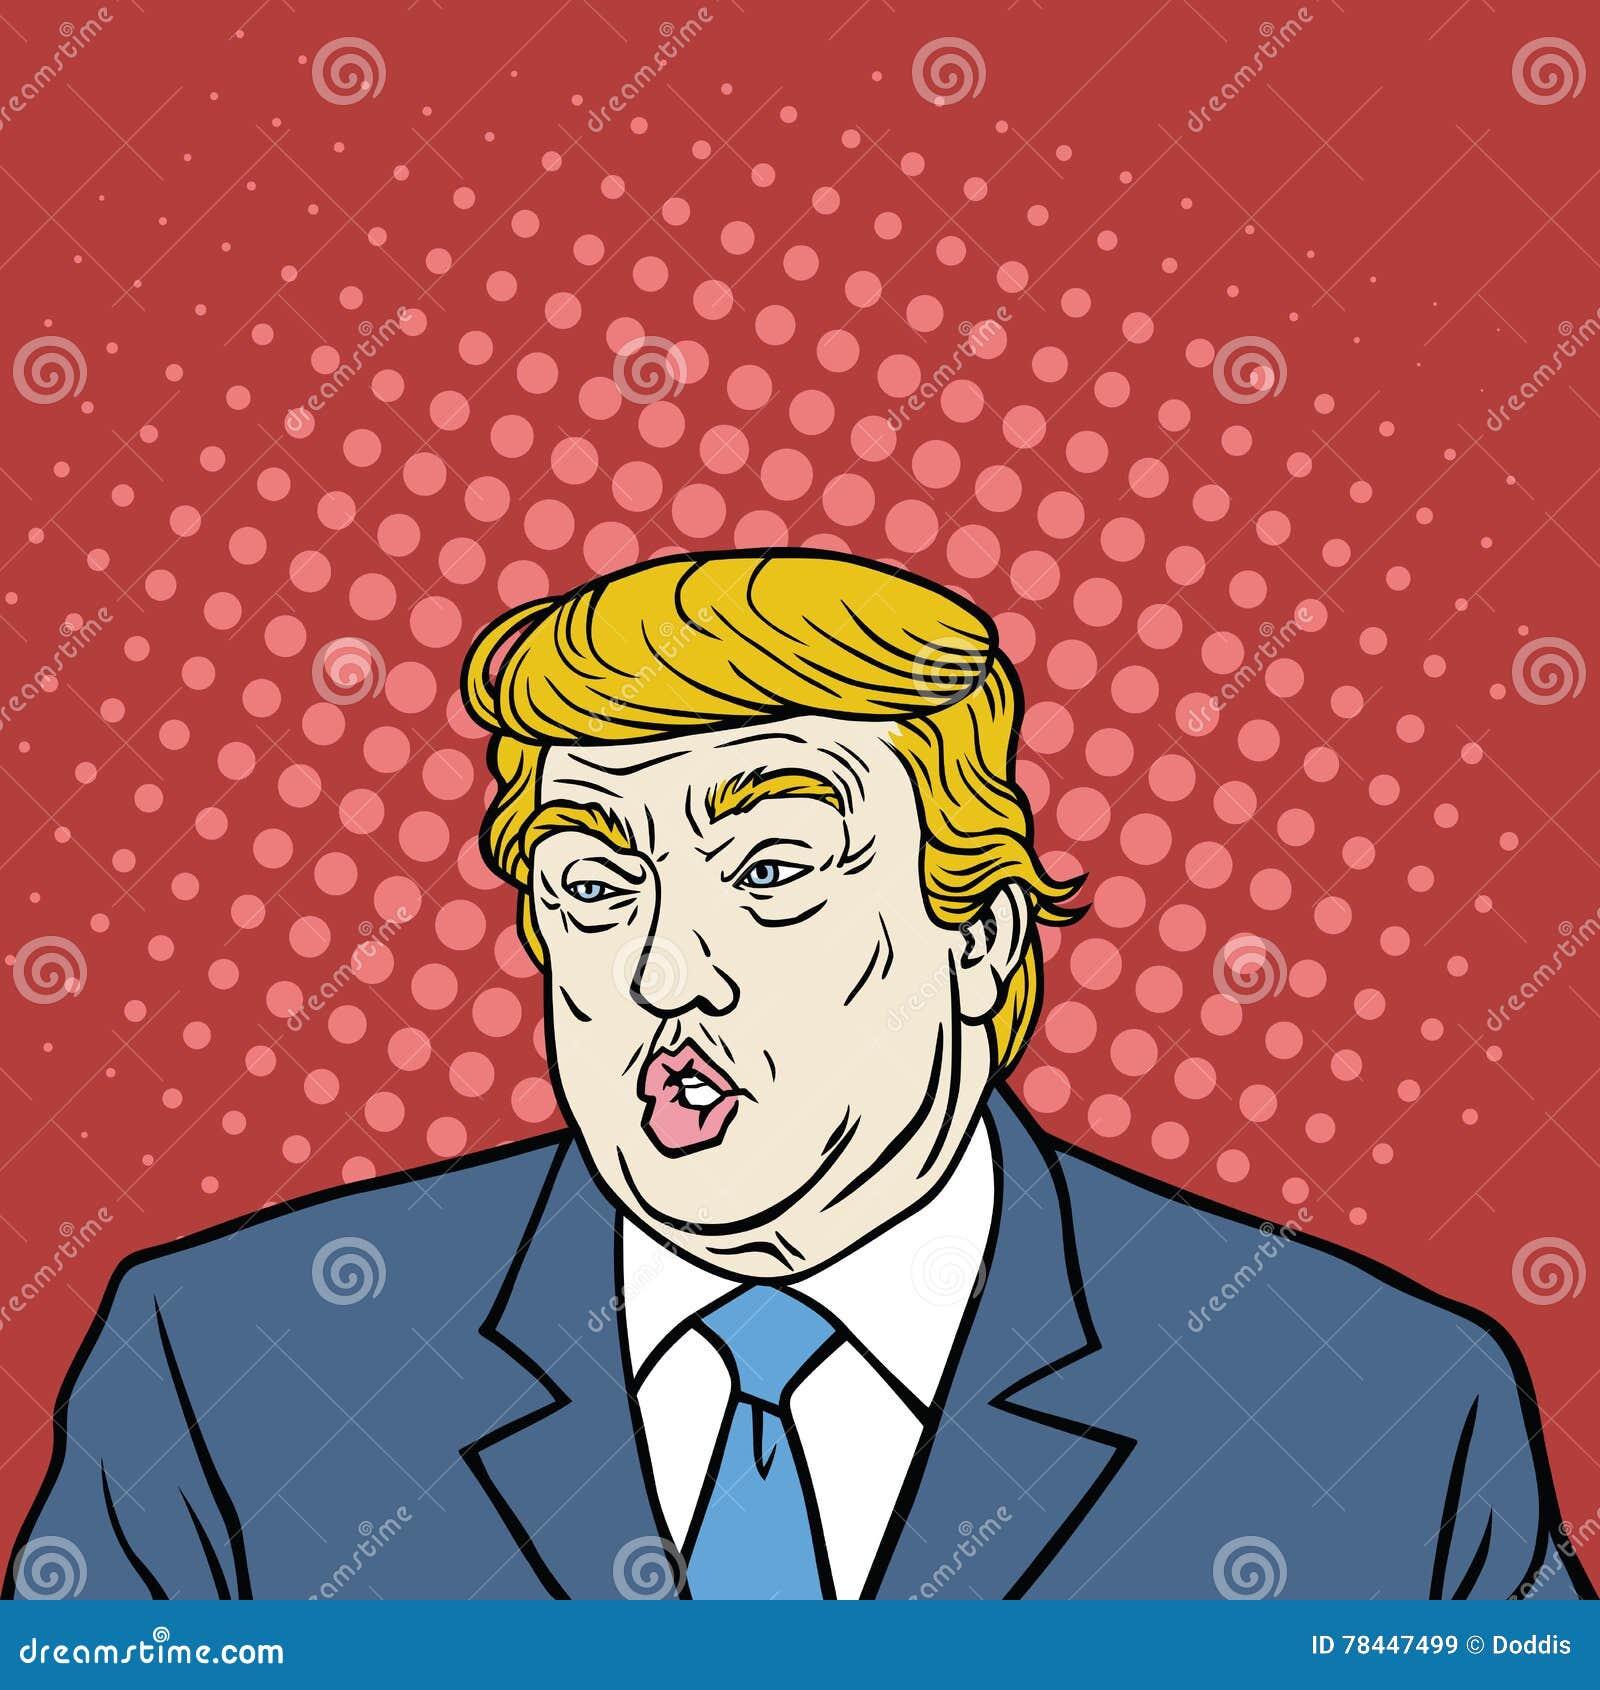 Donald Trump Pop Art Caricature ståendevektor